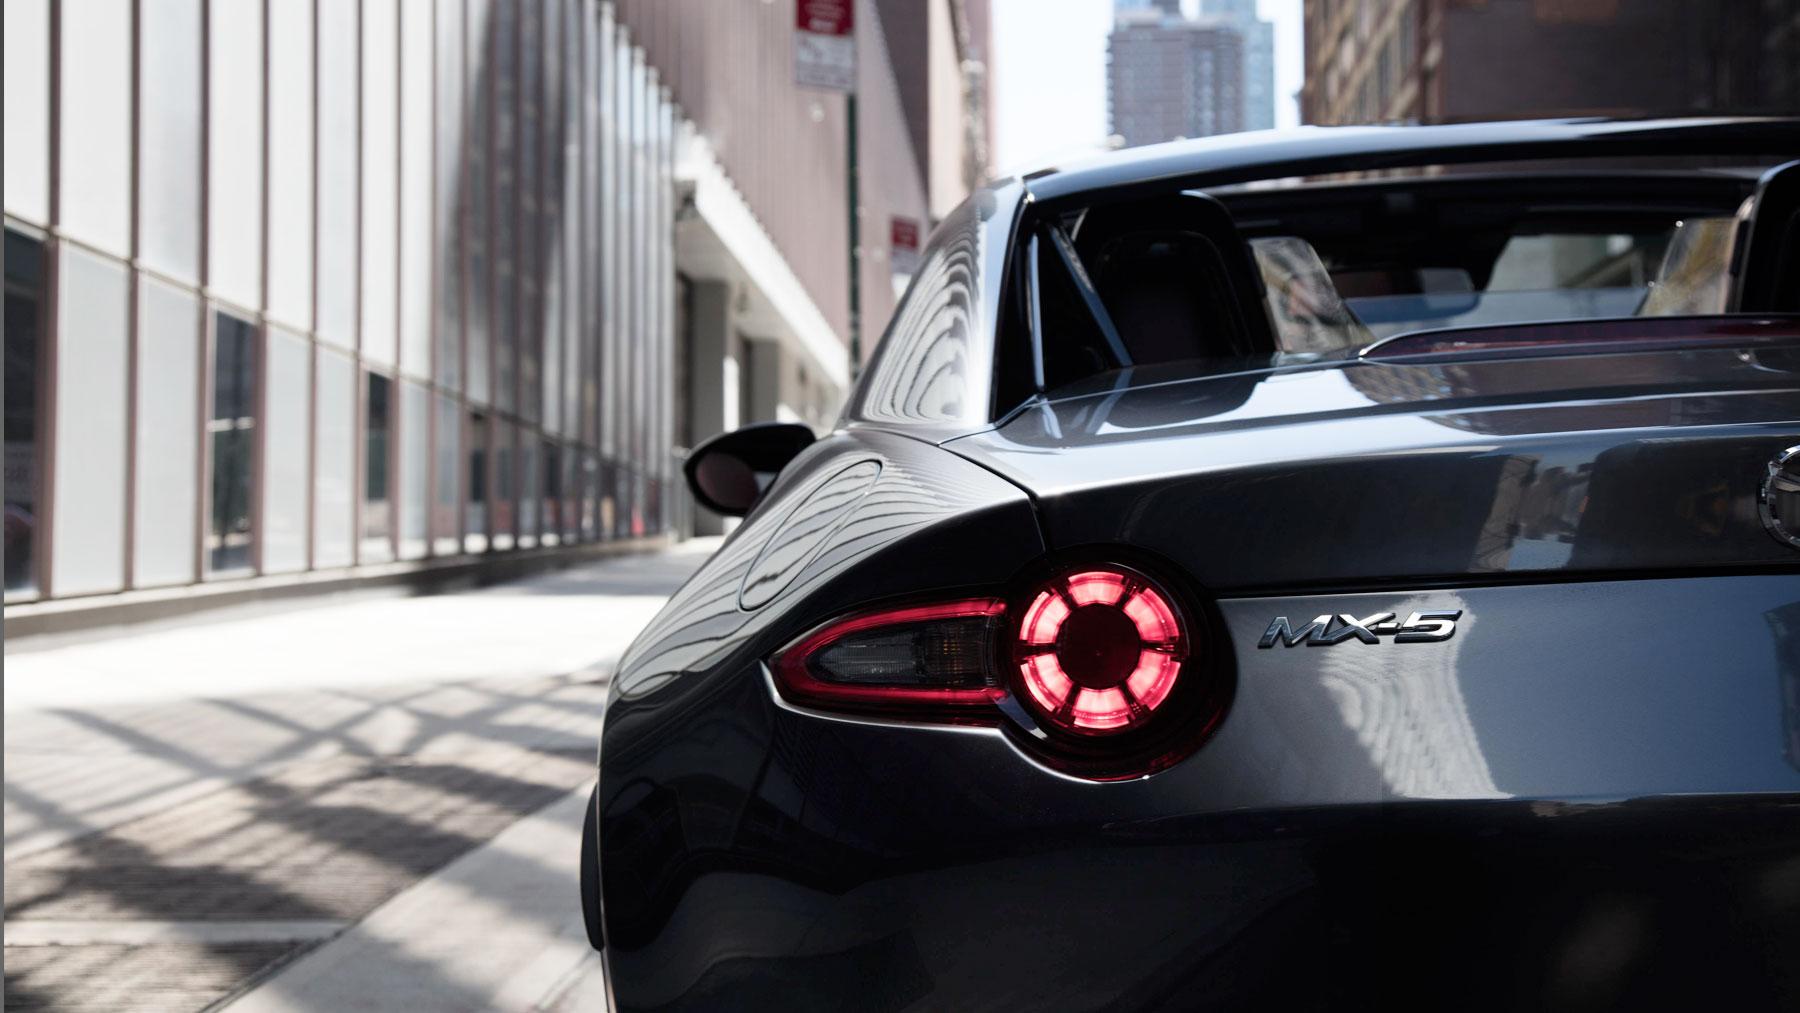 New Mazda MX-5 Miata for Sale Cicero NY